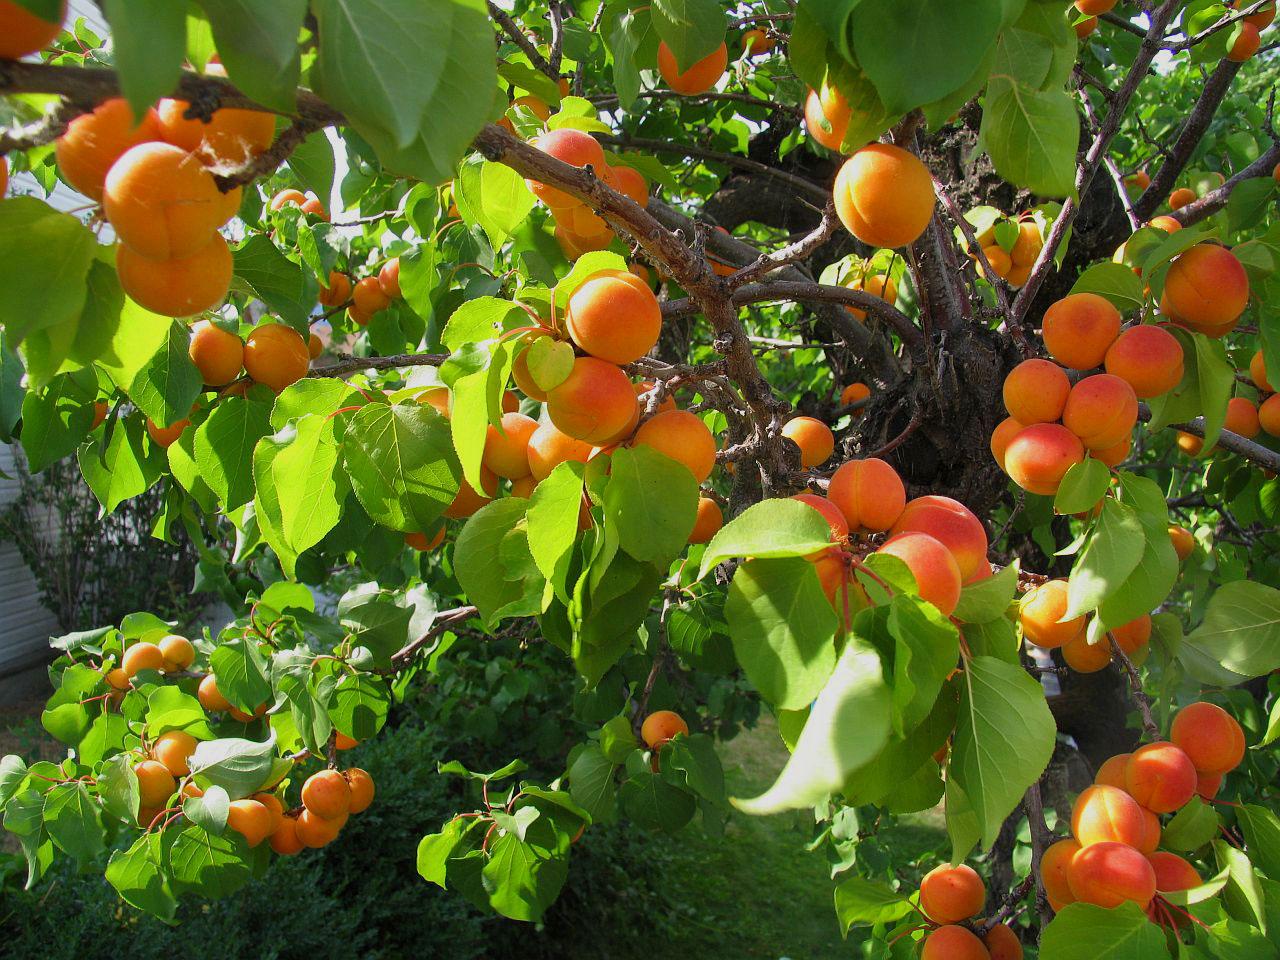 Apricot Tree HD wallpapers, Desktop wallpaper - most viewed